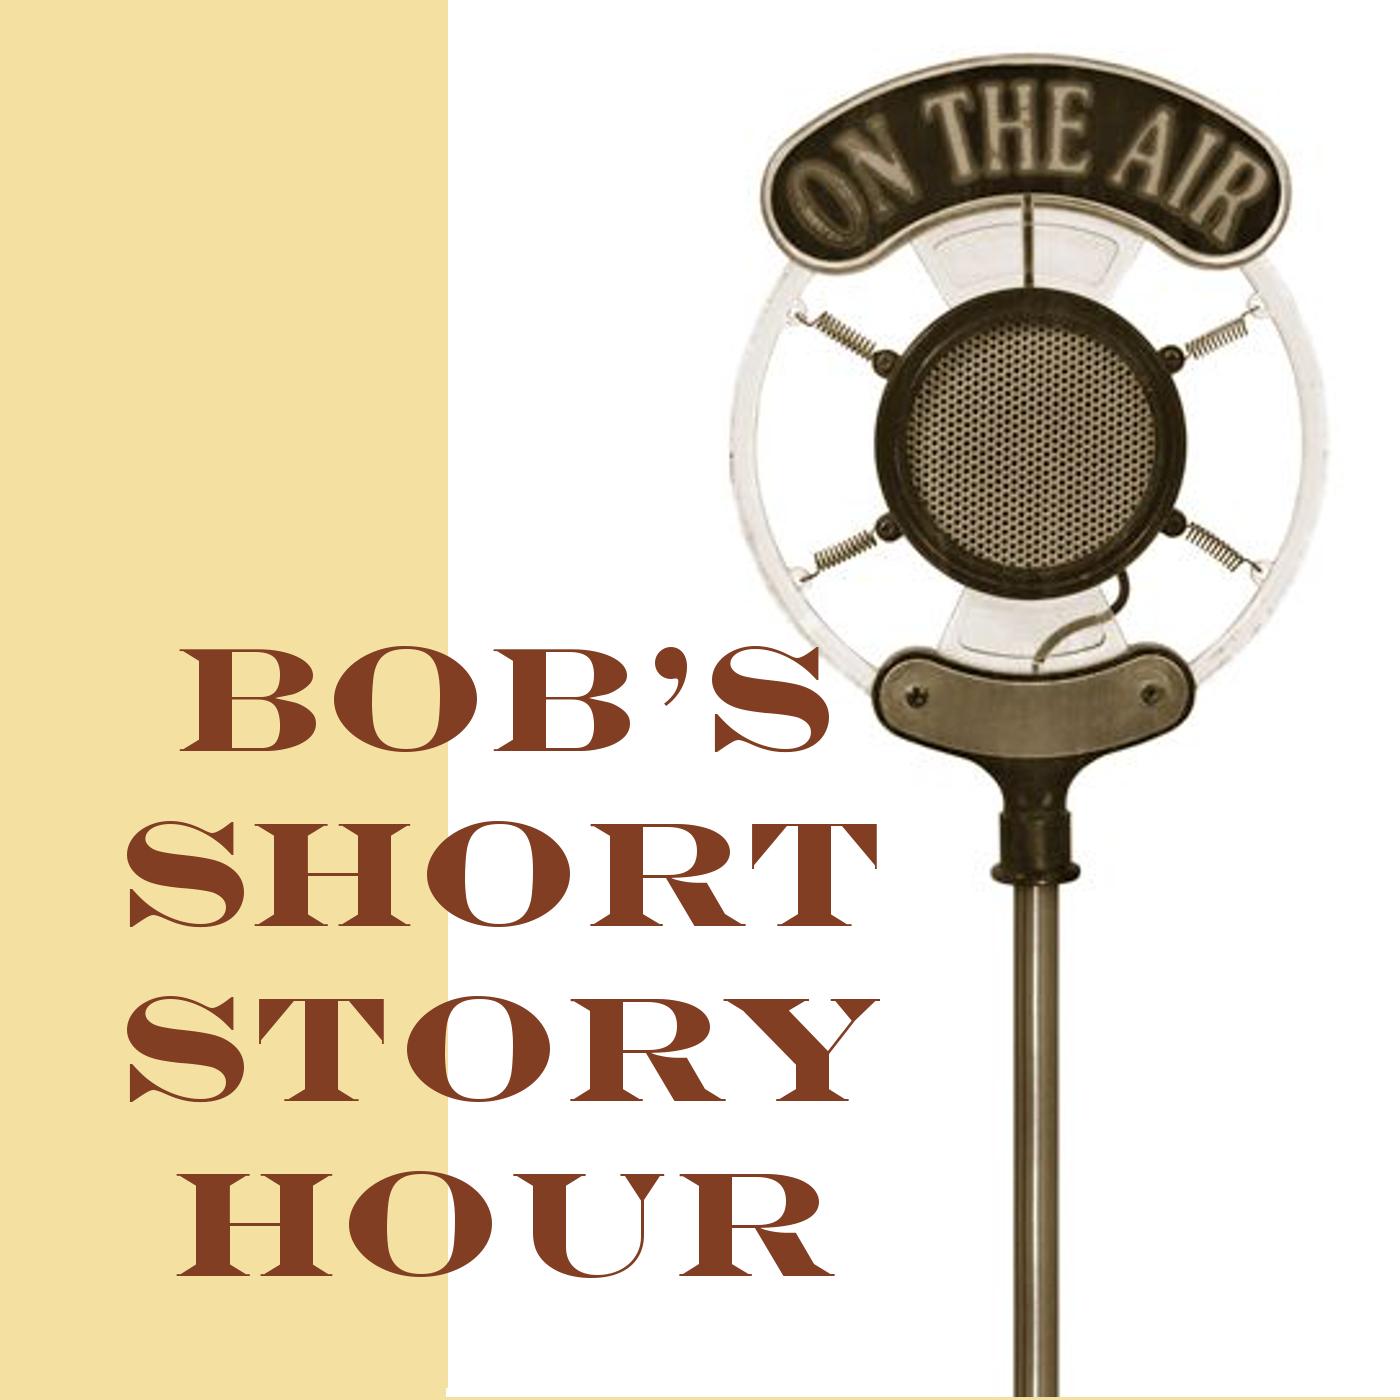 BSSH - Bob's Short Story Hour